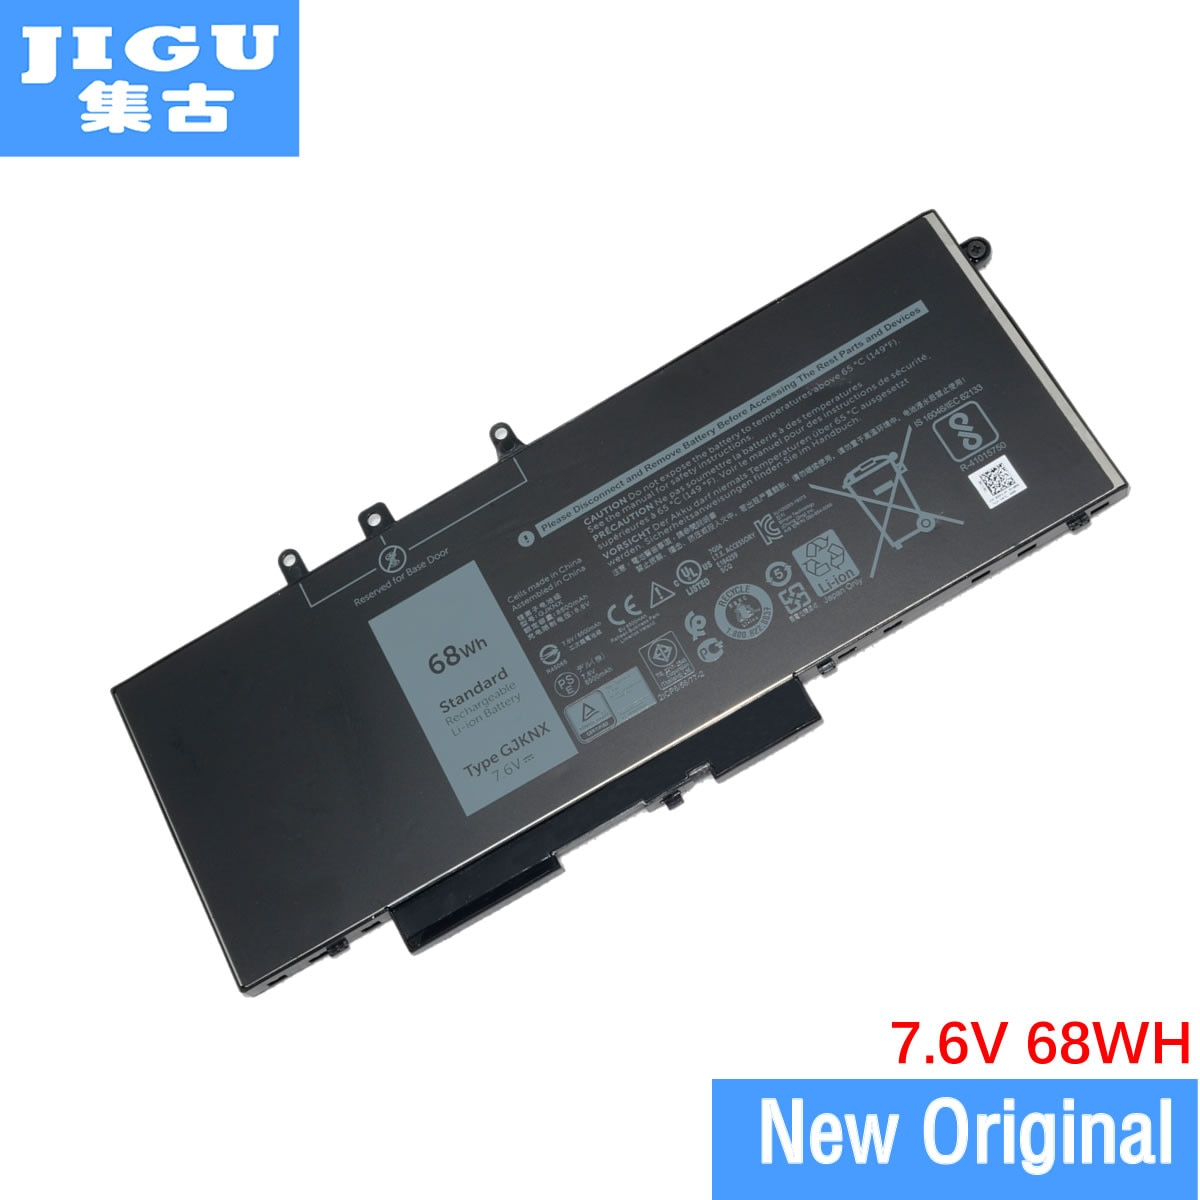 JIGU-بطارية كمبيوتر محمول أصلية ، GJKNX GD1JP ، لأجهزة Dell Latitude 5480 5490 5491 5580 E5280 E5580 7.6V 68WH